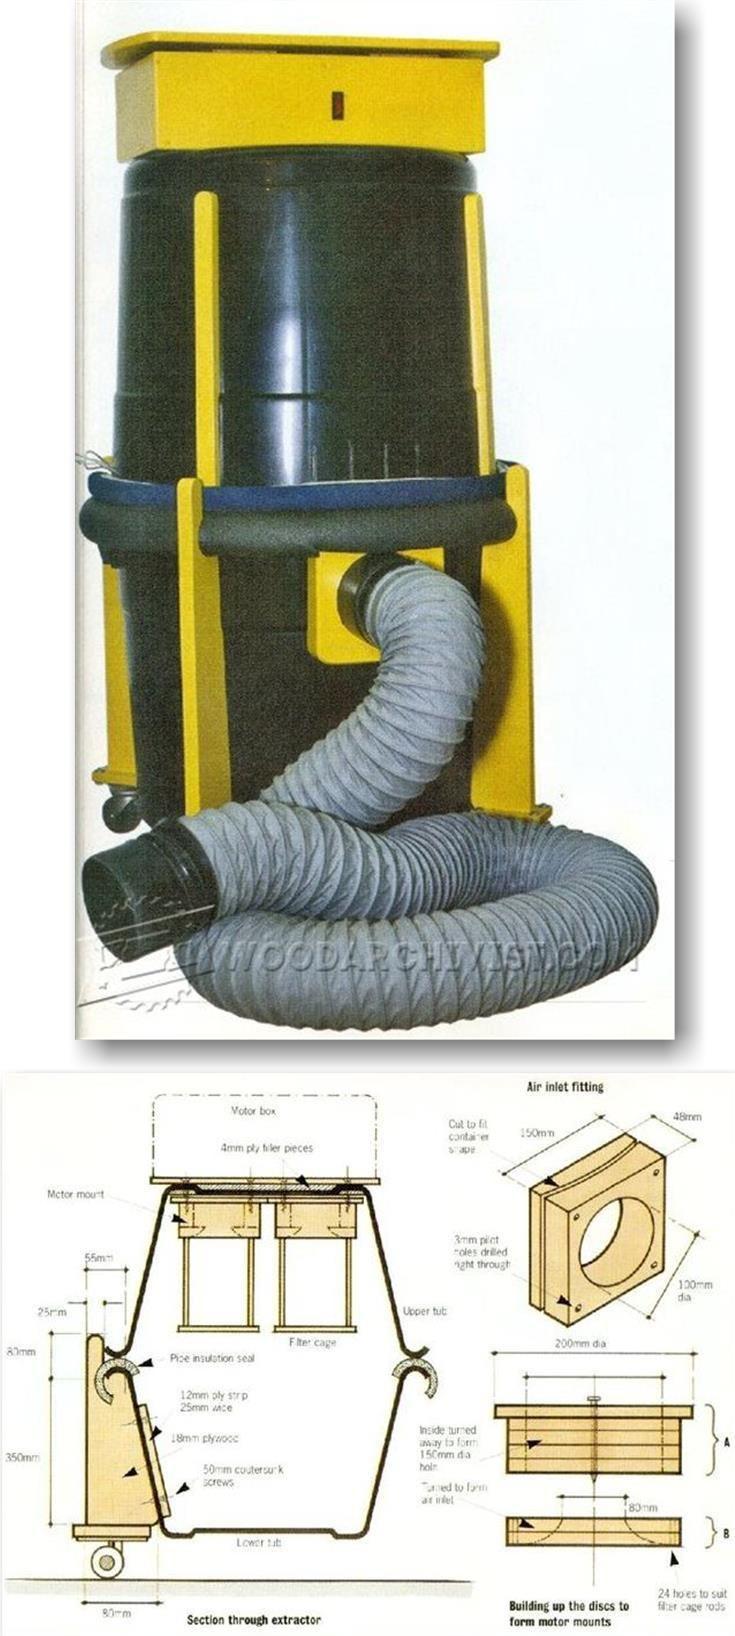 DIY Dust Extractor - Dust Collection Tips, Jigs and Fixtures | WoodArchivist.com